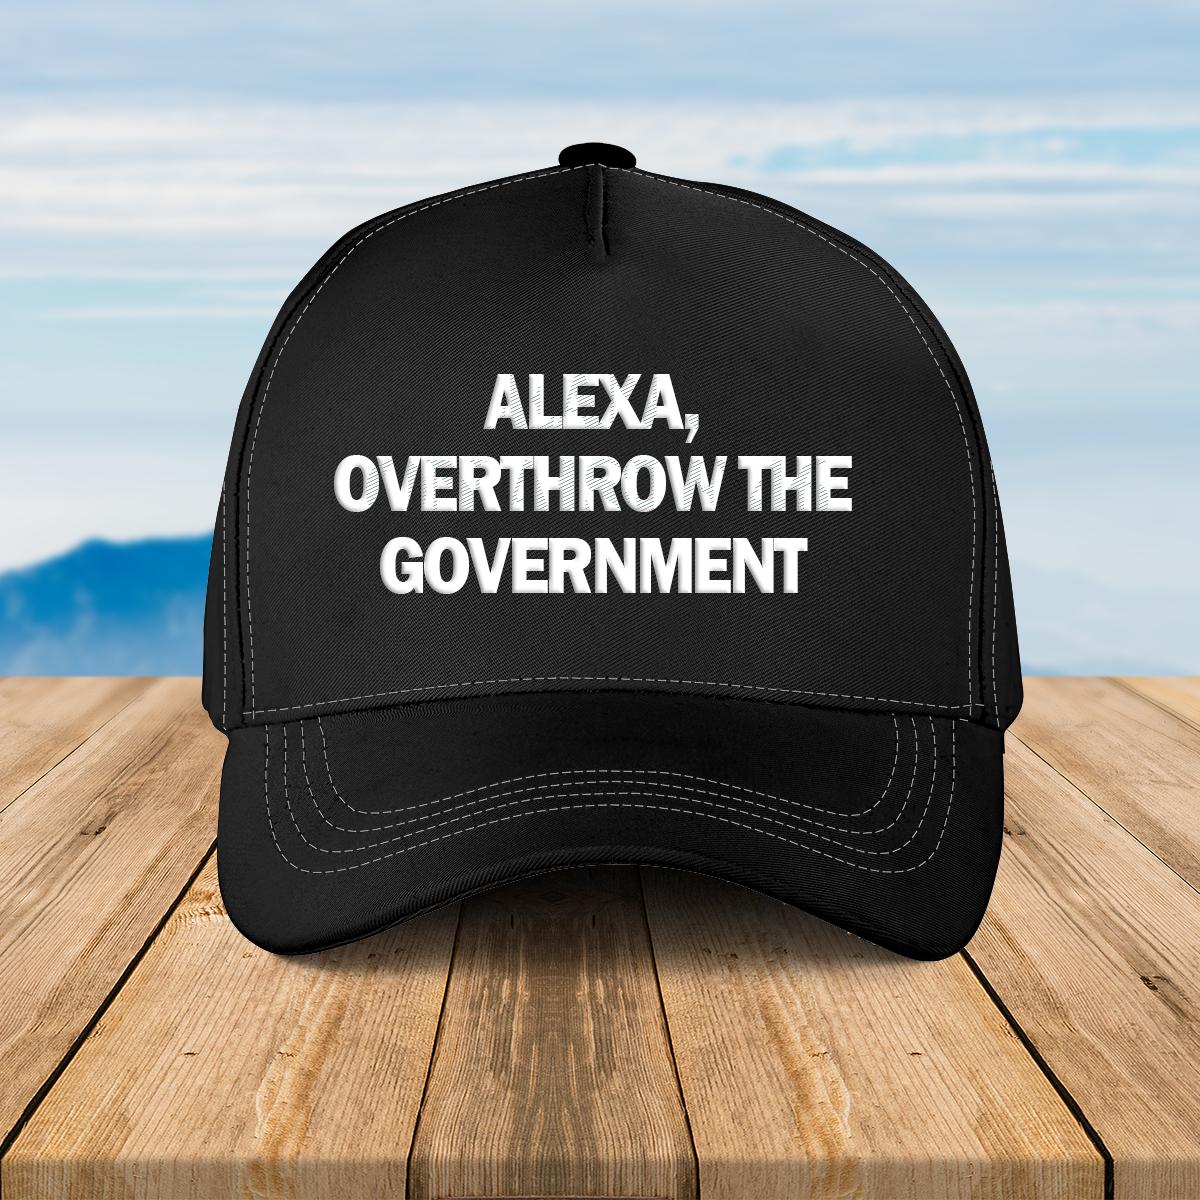 Alexa overthrow the government full print classic hat